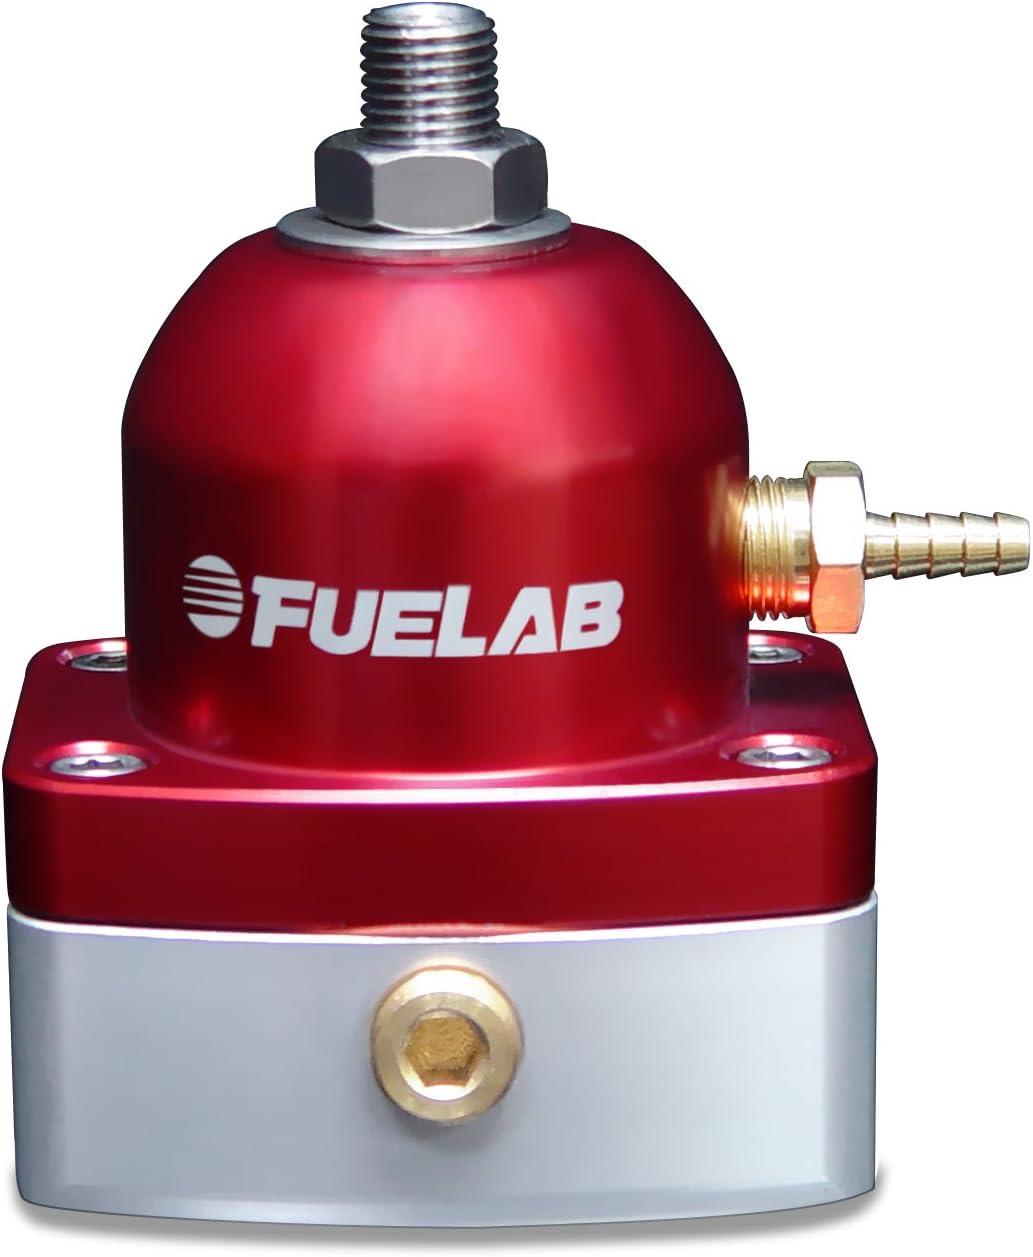 FUELAB Universal Red EFI Fuel Regulator Pressure Adjustable Spring new work Max 69% OFF